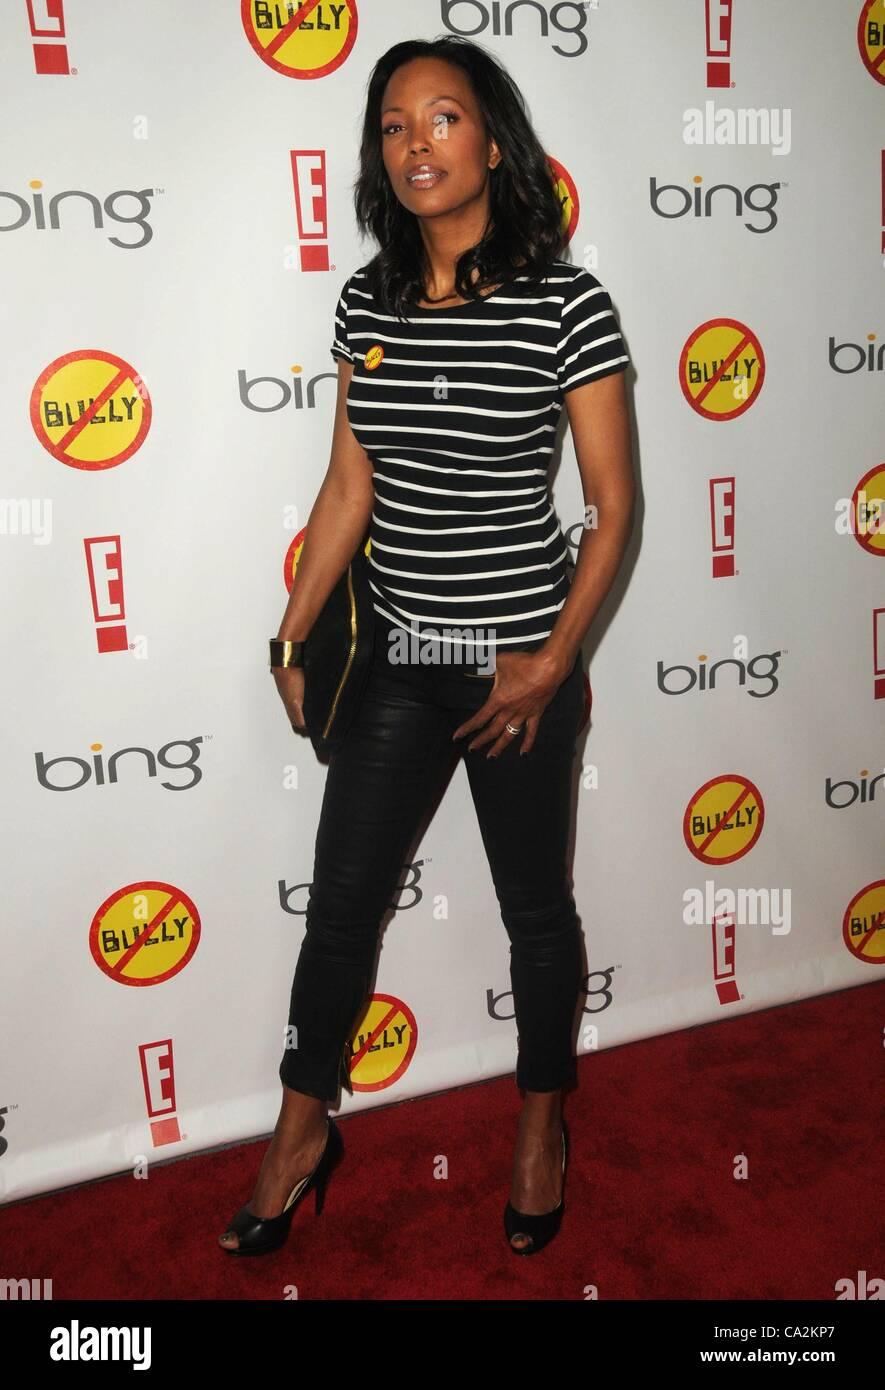 Aisha Tyler – Wikipedia